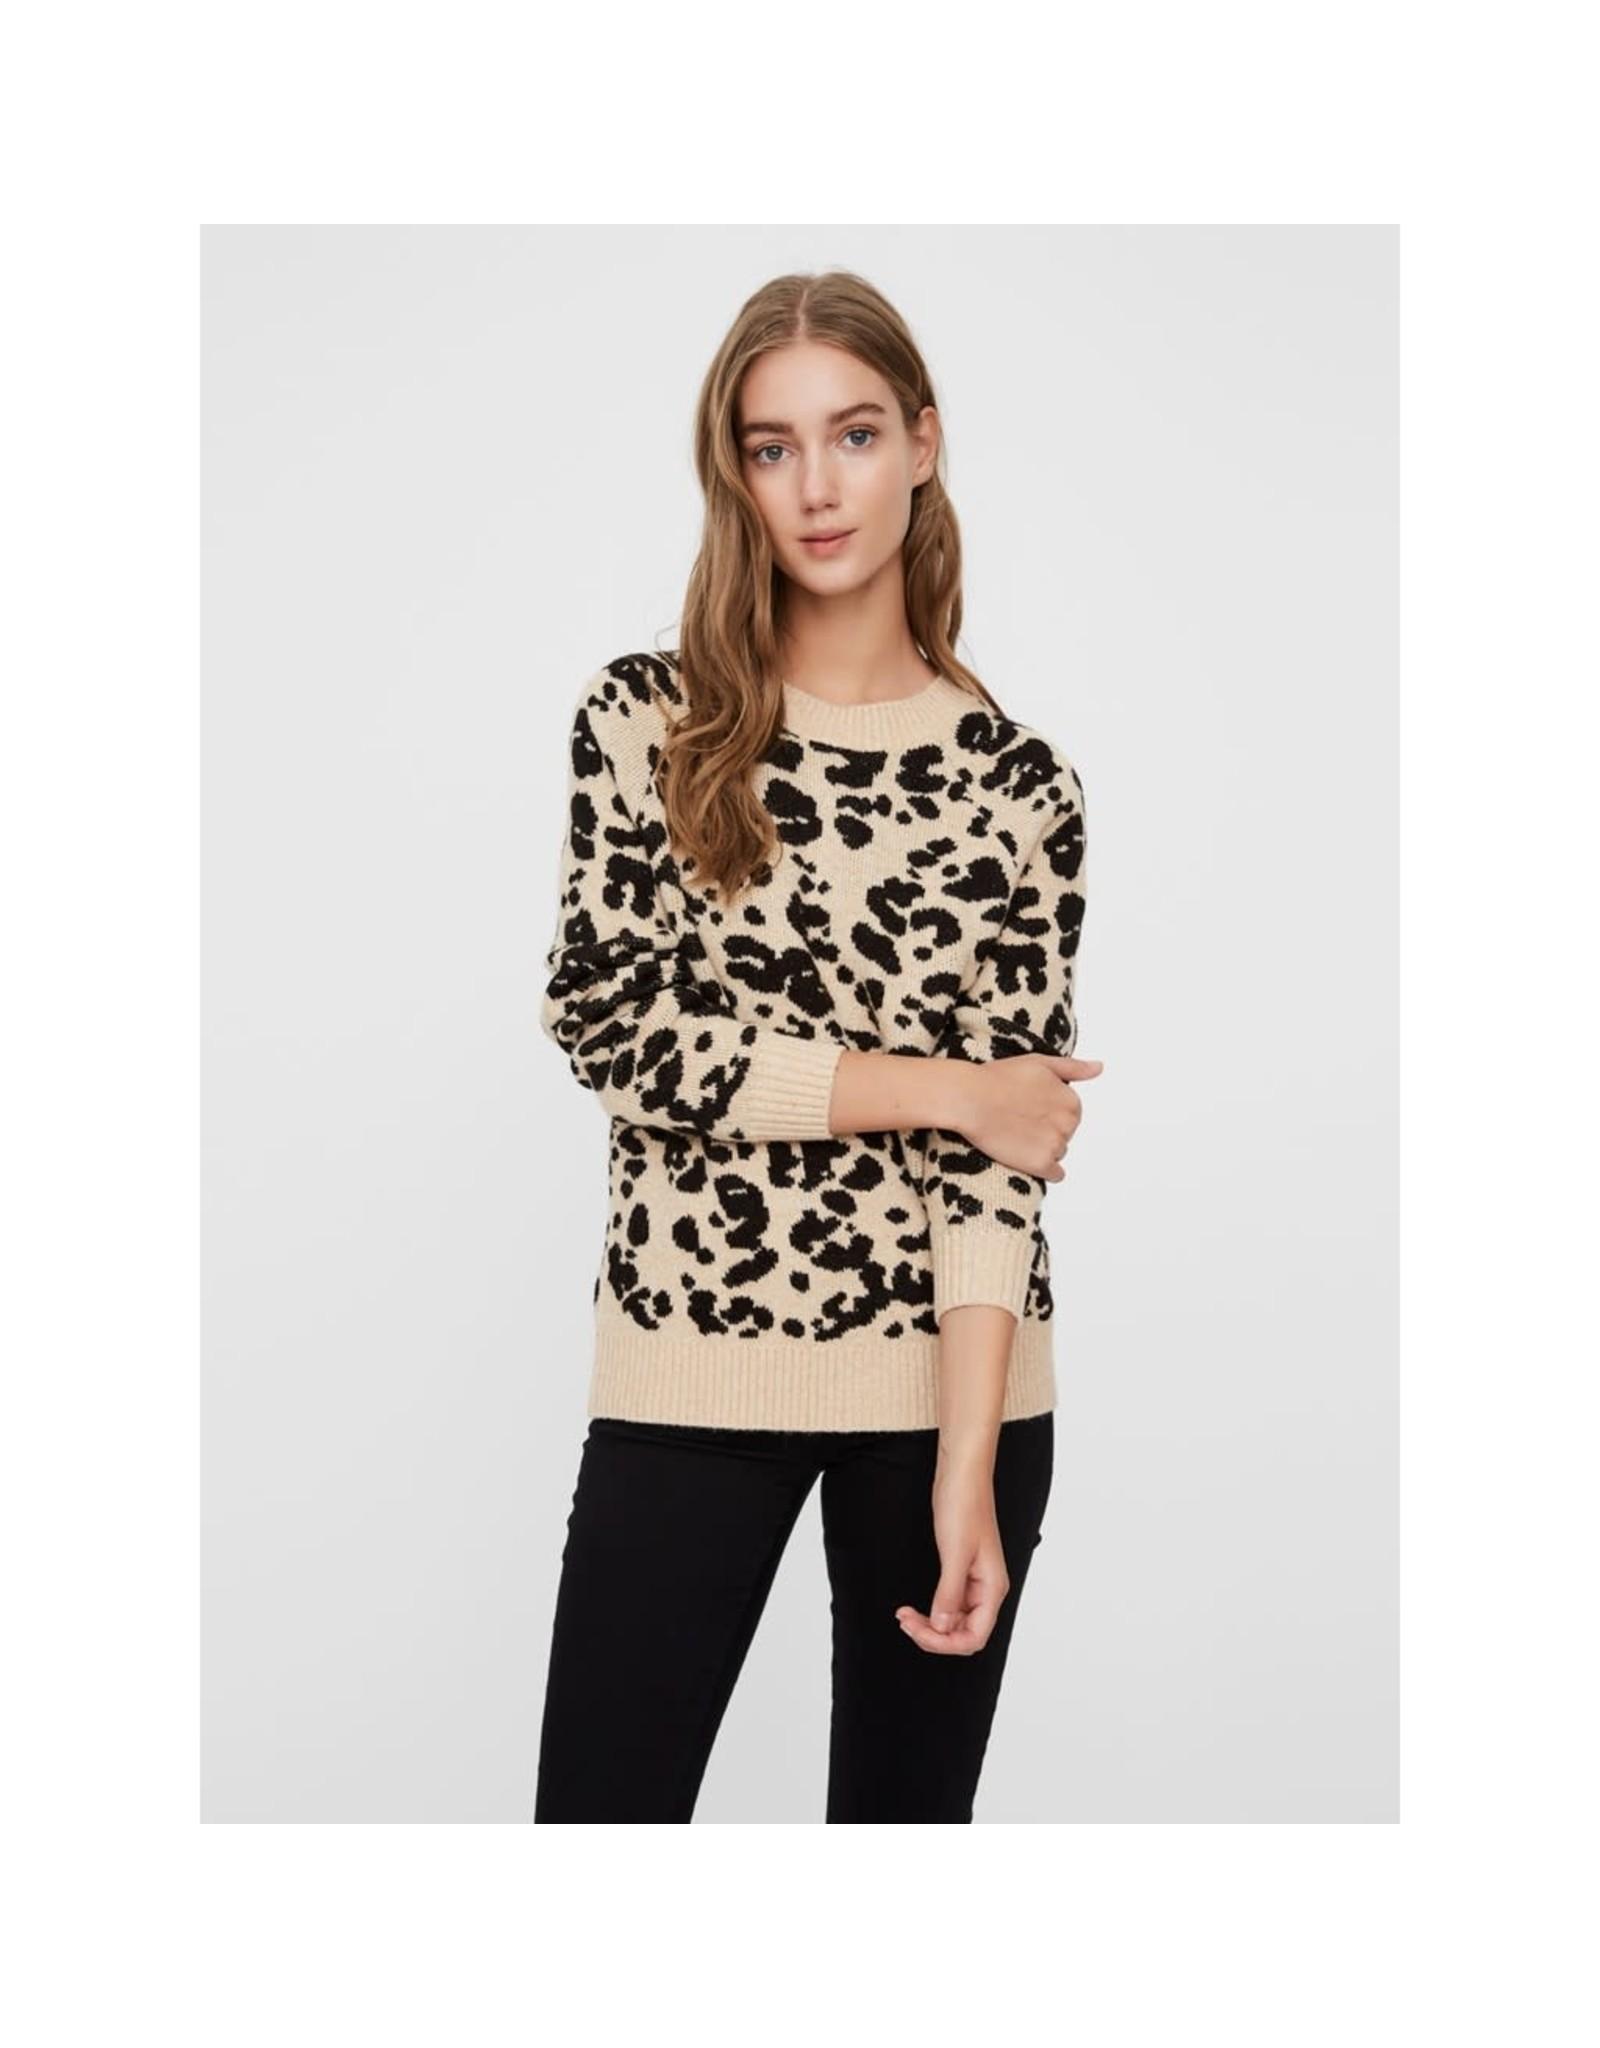 Vero Moda Emma Leopard Print Sweater